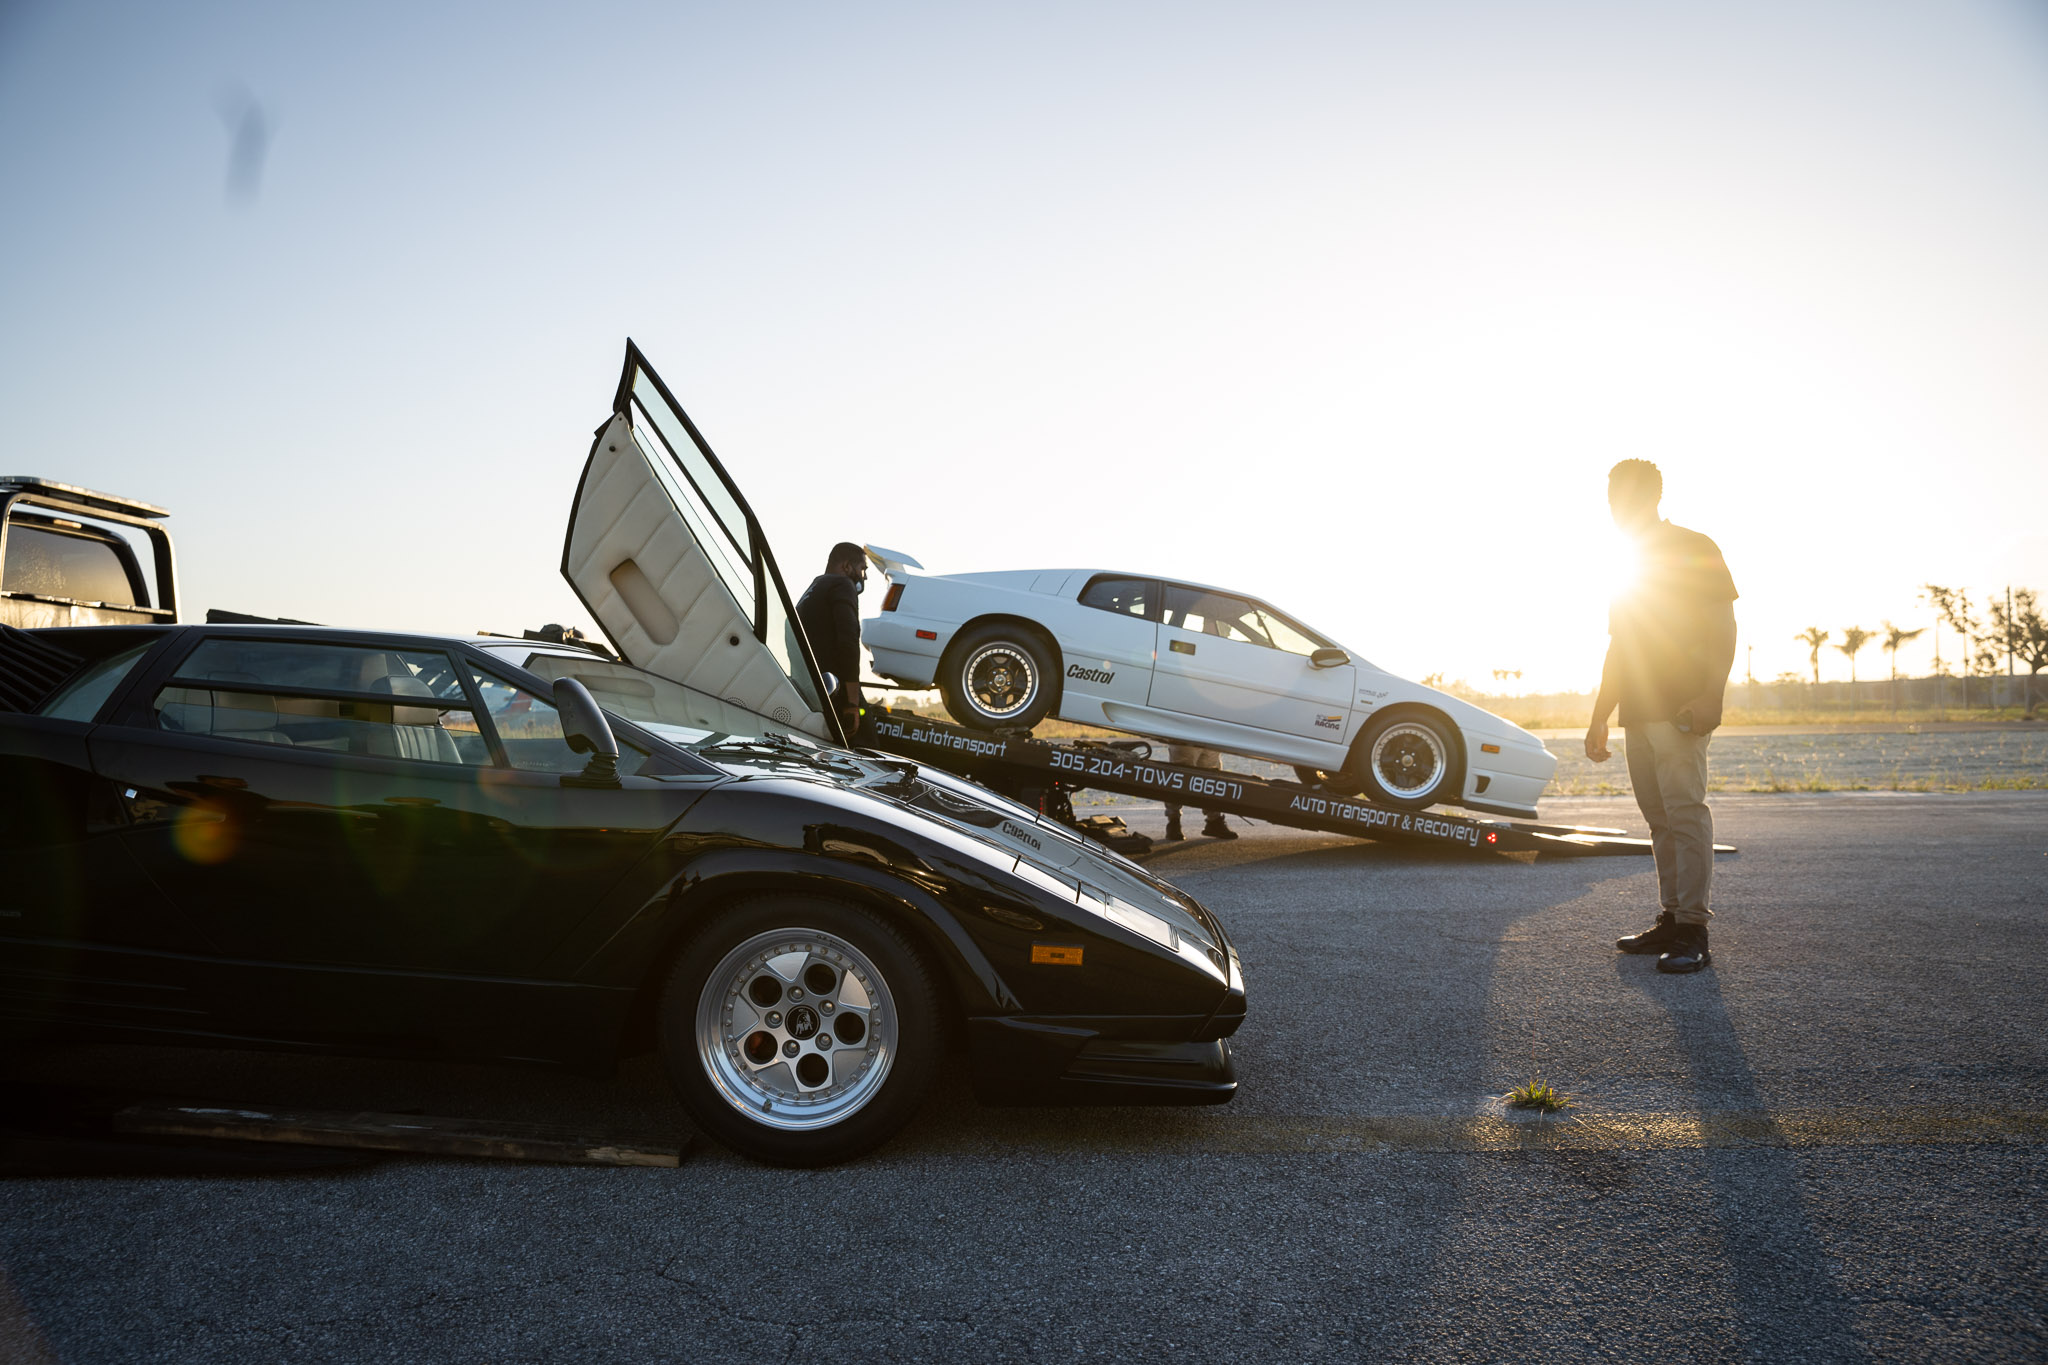 Lamborghini Countach with Lotus Esprit X180R side profiles